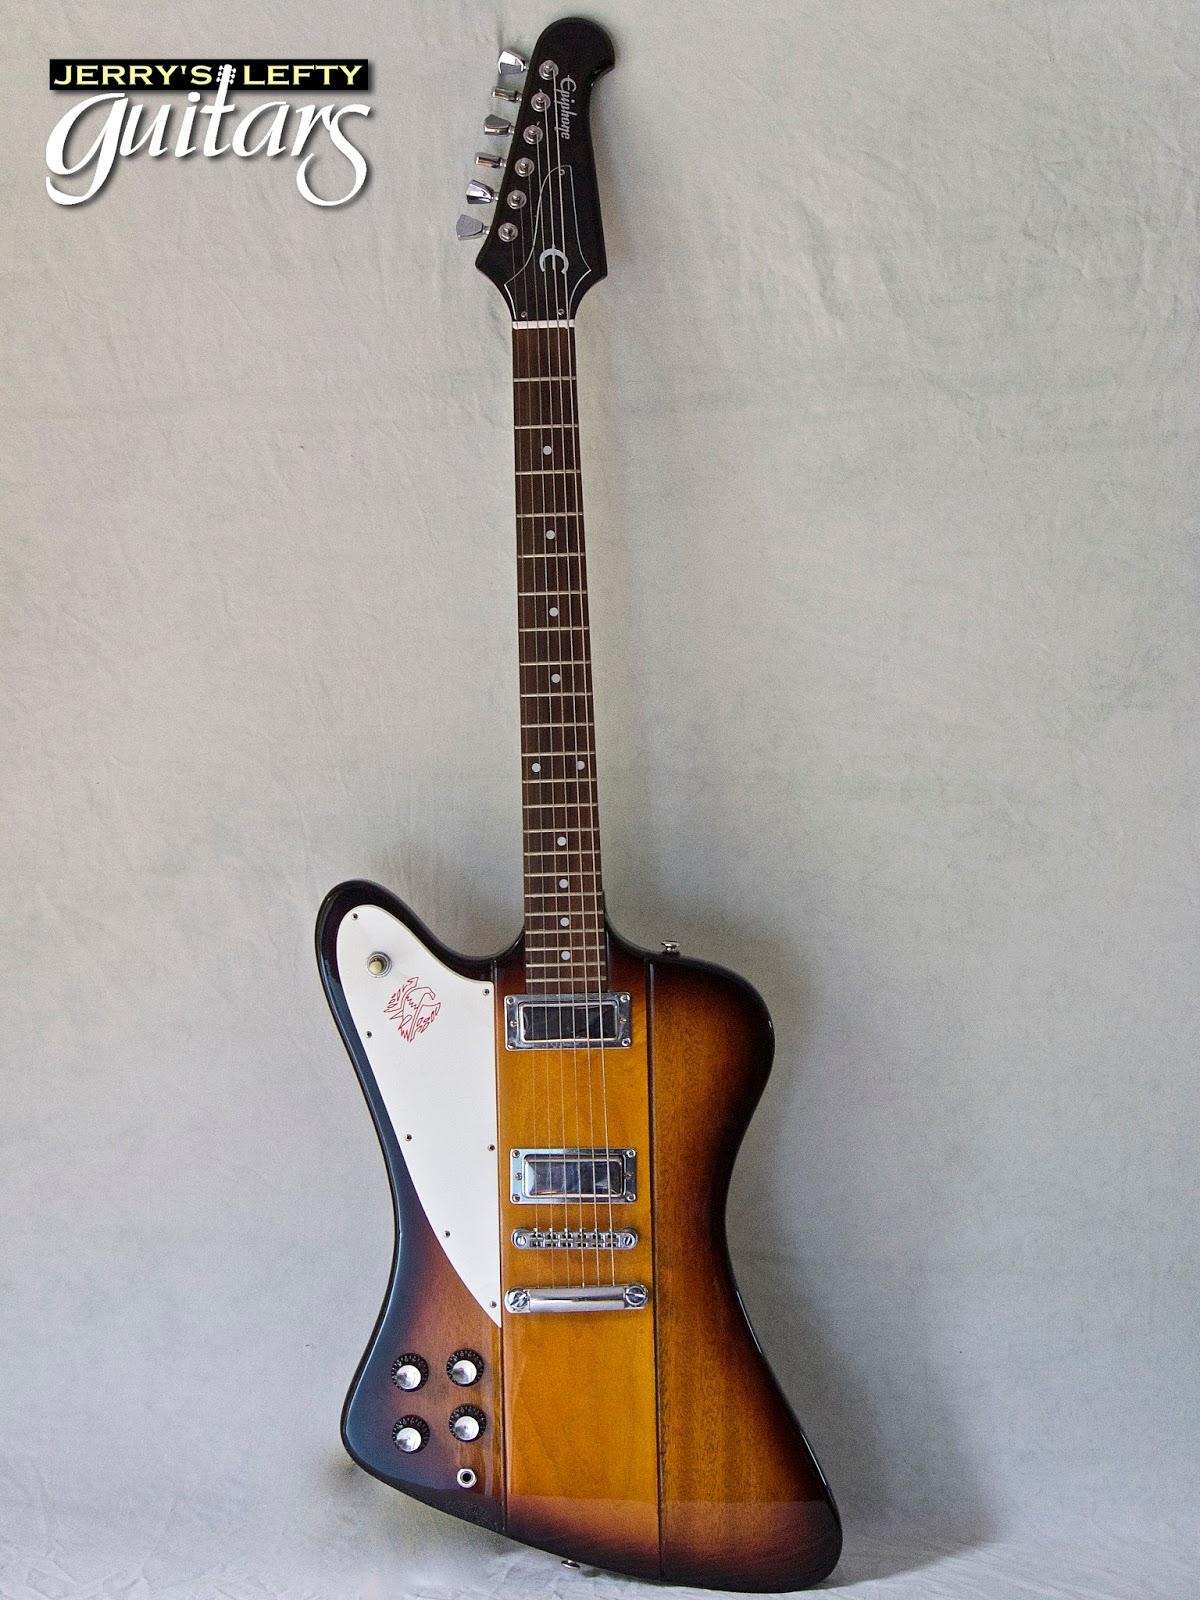 jerry 39 s lefty guitars newest guitar arrivals updated weekly epiphone firebird sunburst left. Black Bedroom Furniture Sets. Home Design Ideas